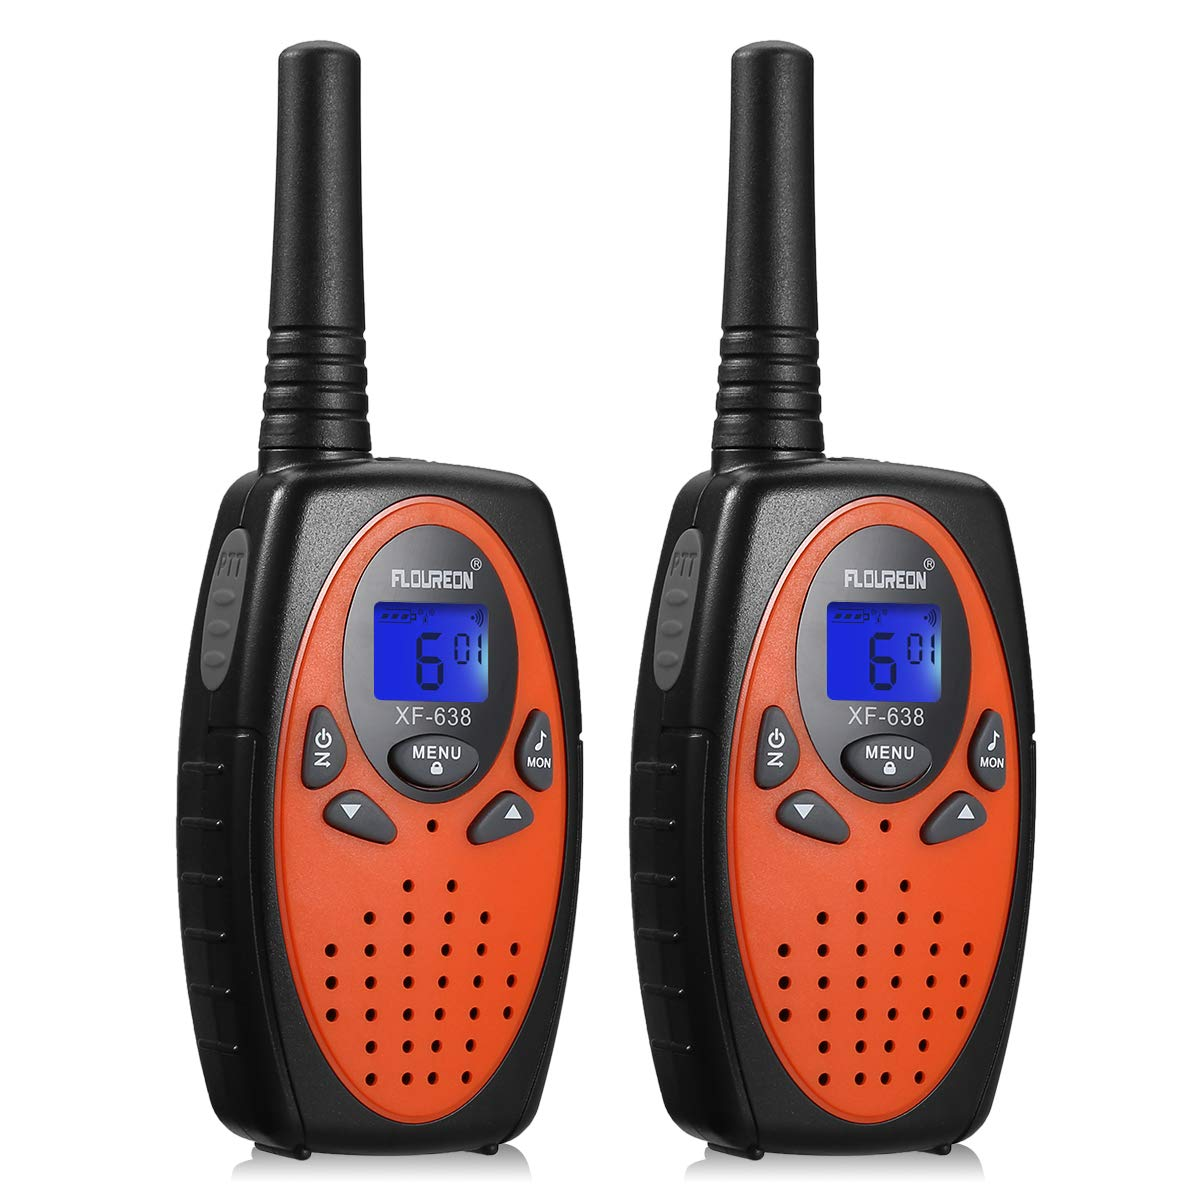 1 Pair 22CH FRS//GMRS Walkie Talkies UHF462-467MHZ 2-Way Radio 5KM Interphone US